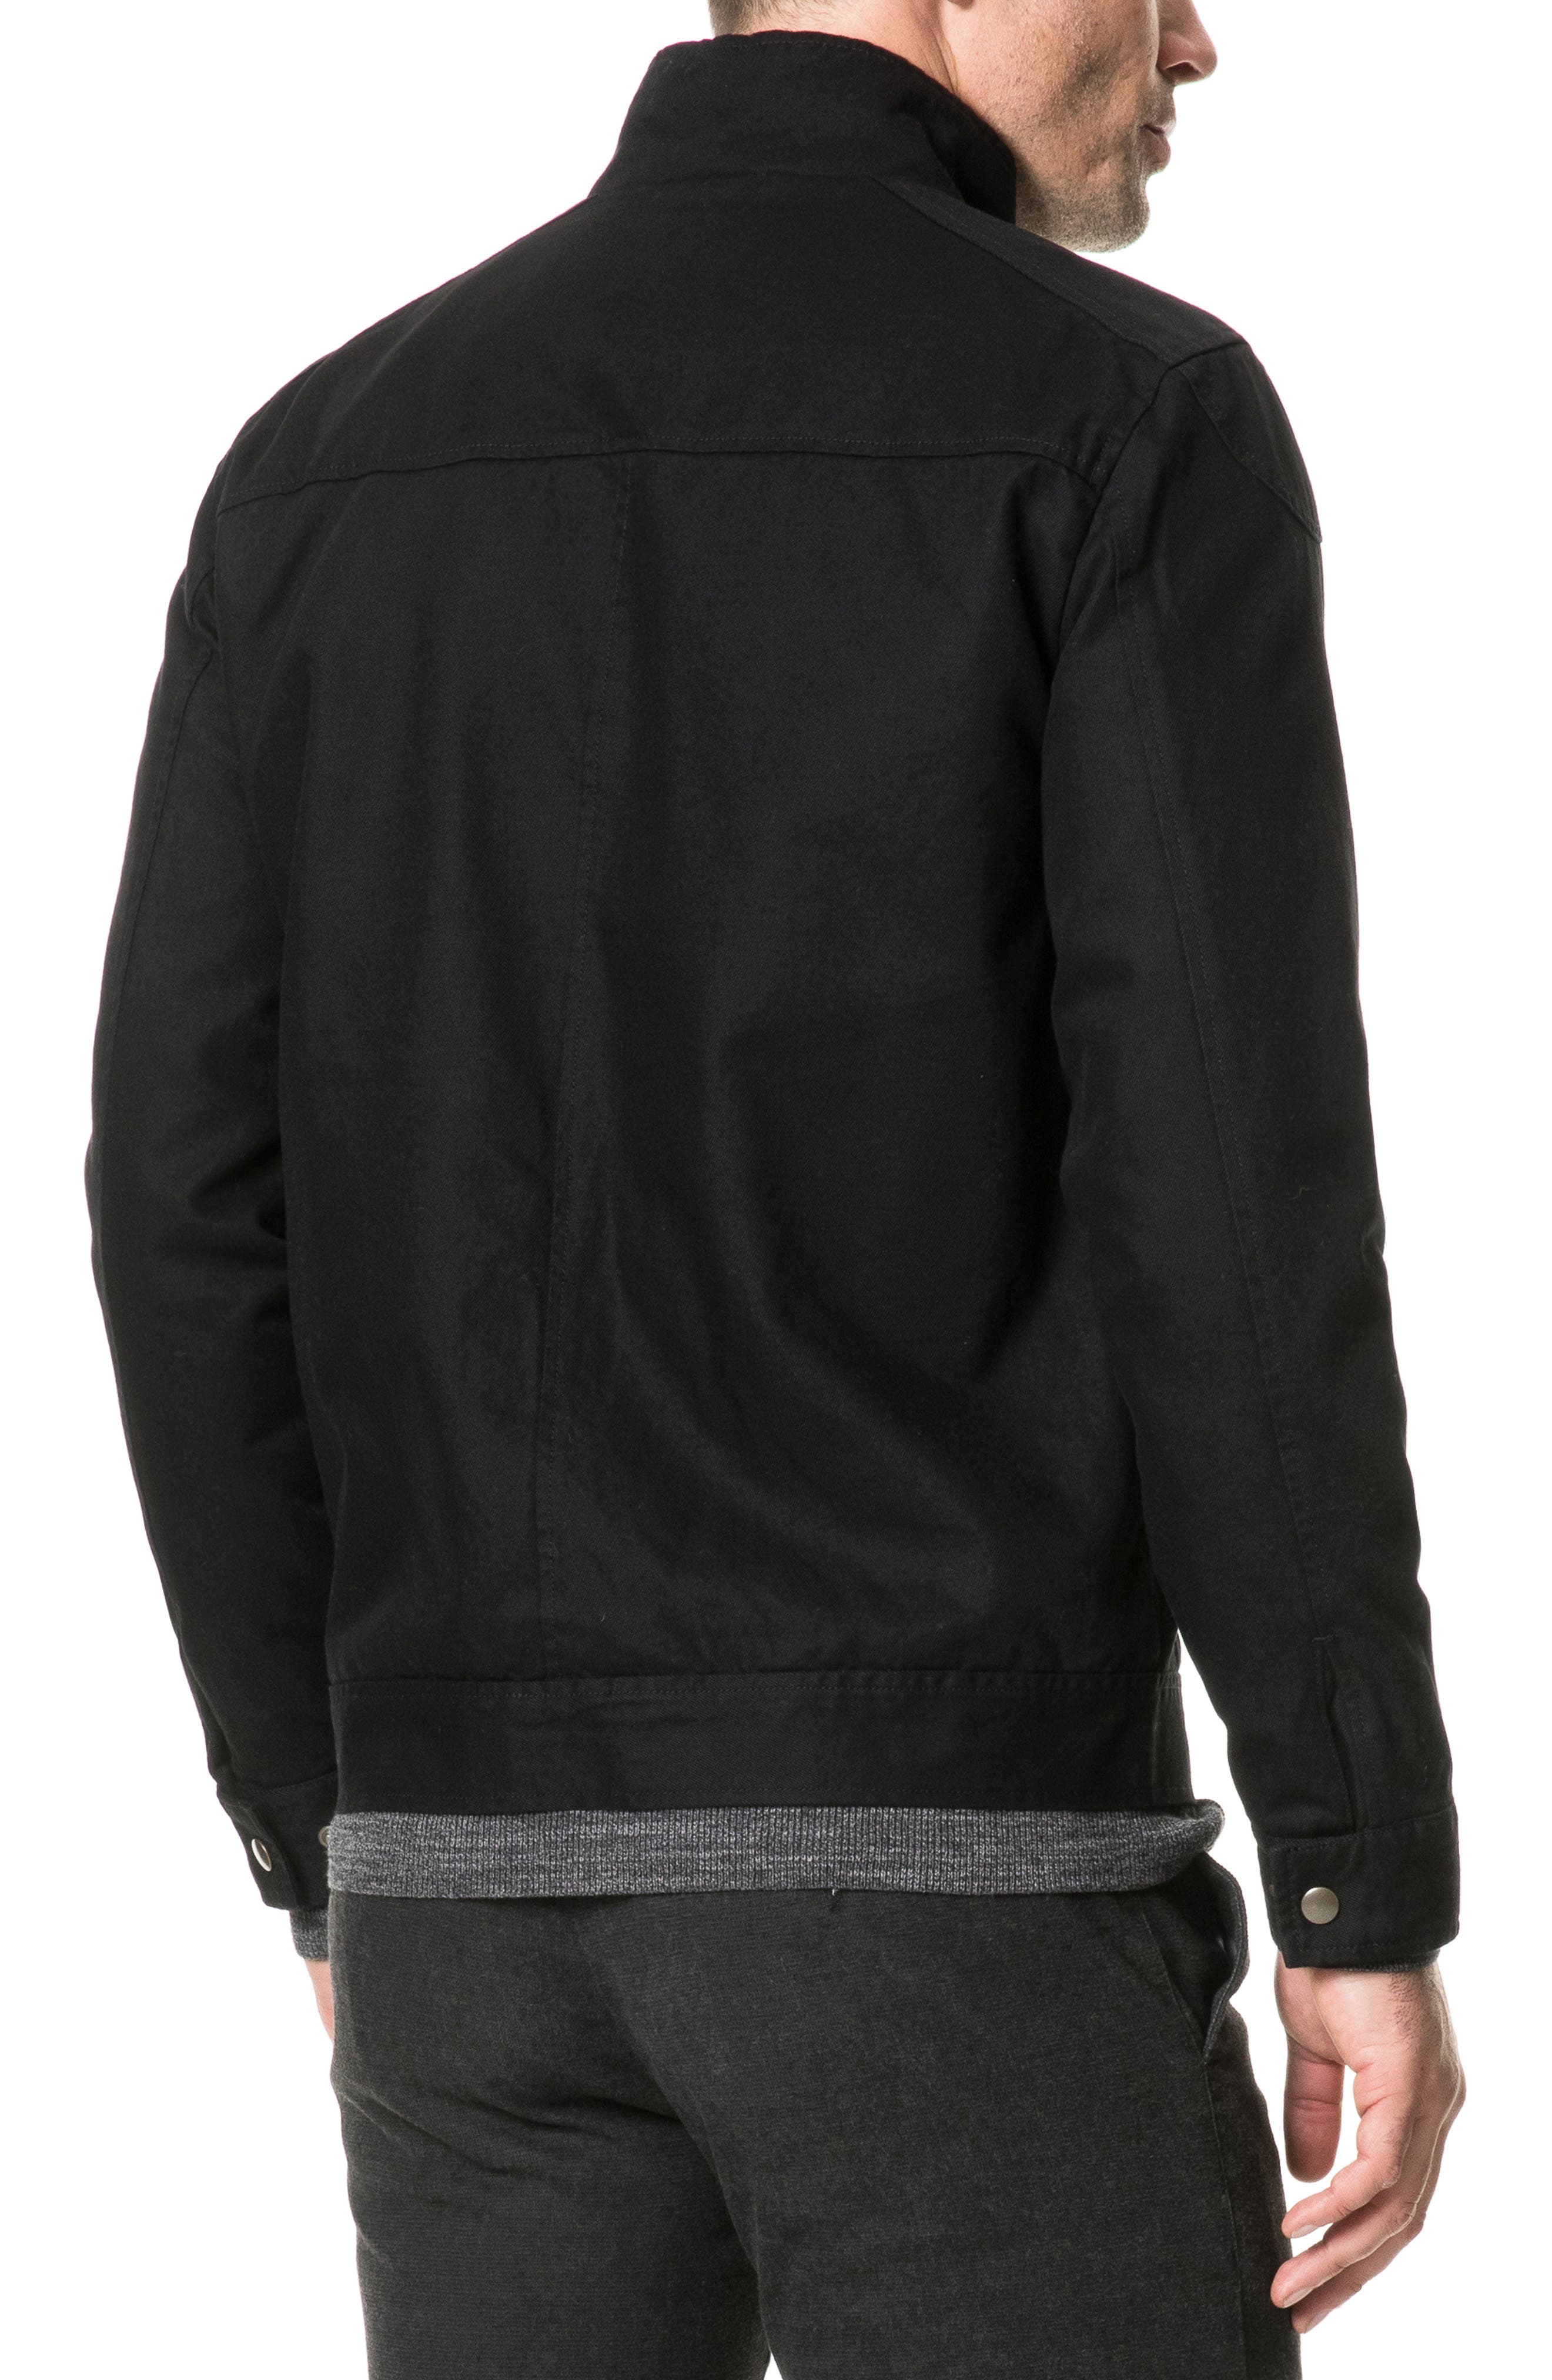 Campbell Point Jacket,                             Alternate thumbnail 2, color,                             NAVY